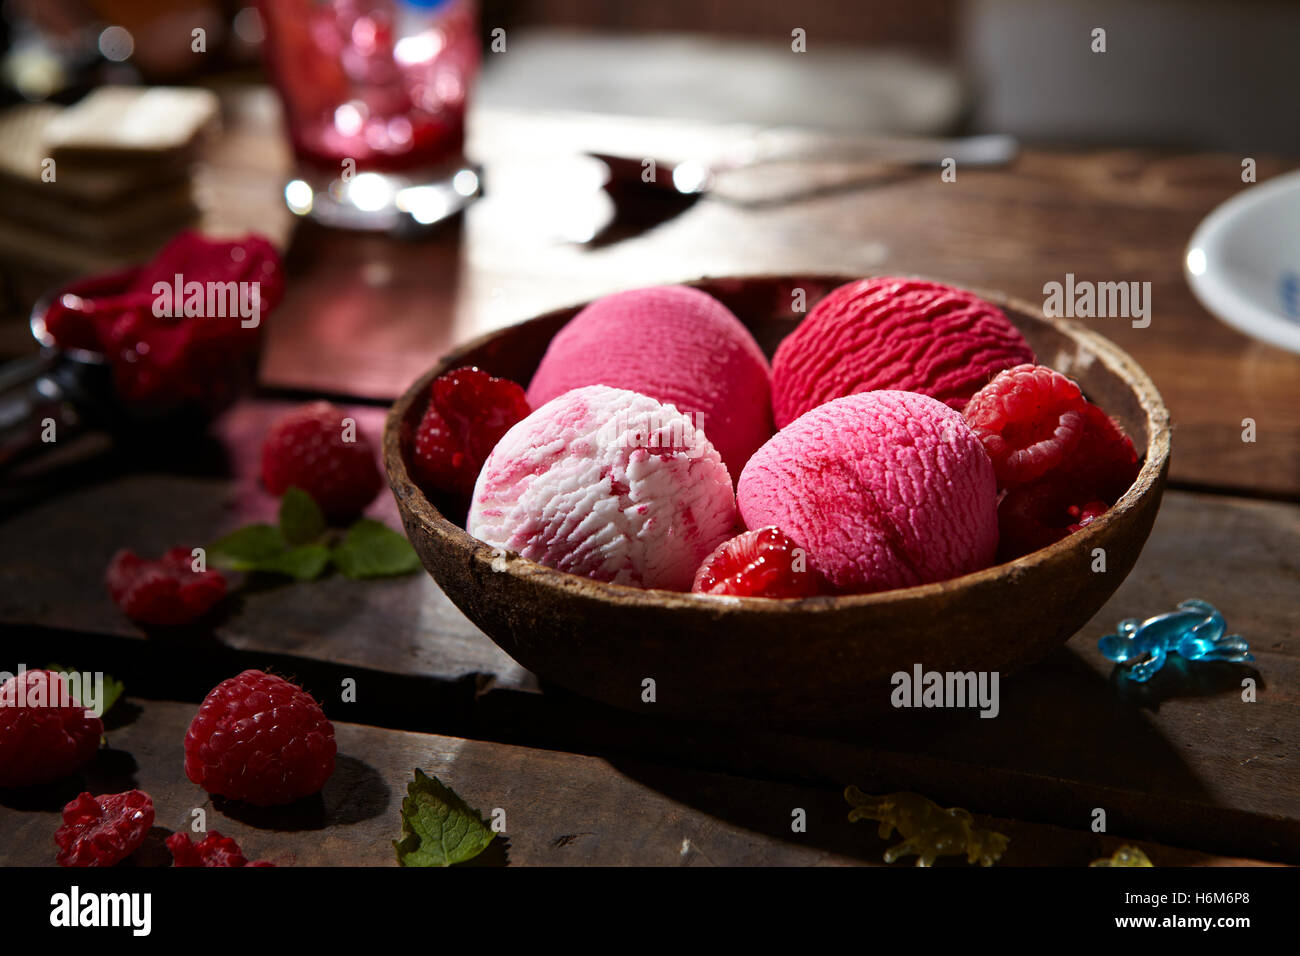 Fraise et glace vanille Photo Stock